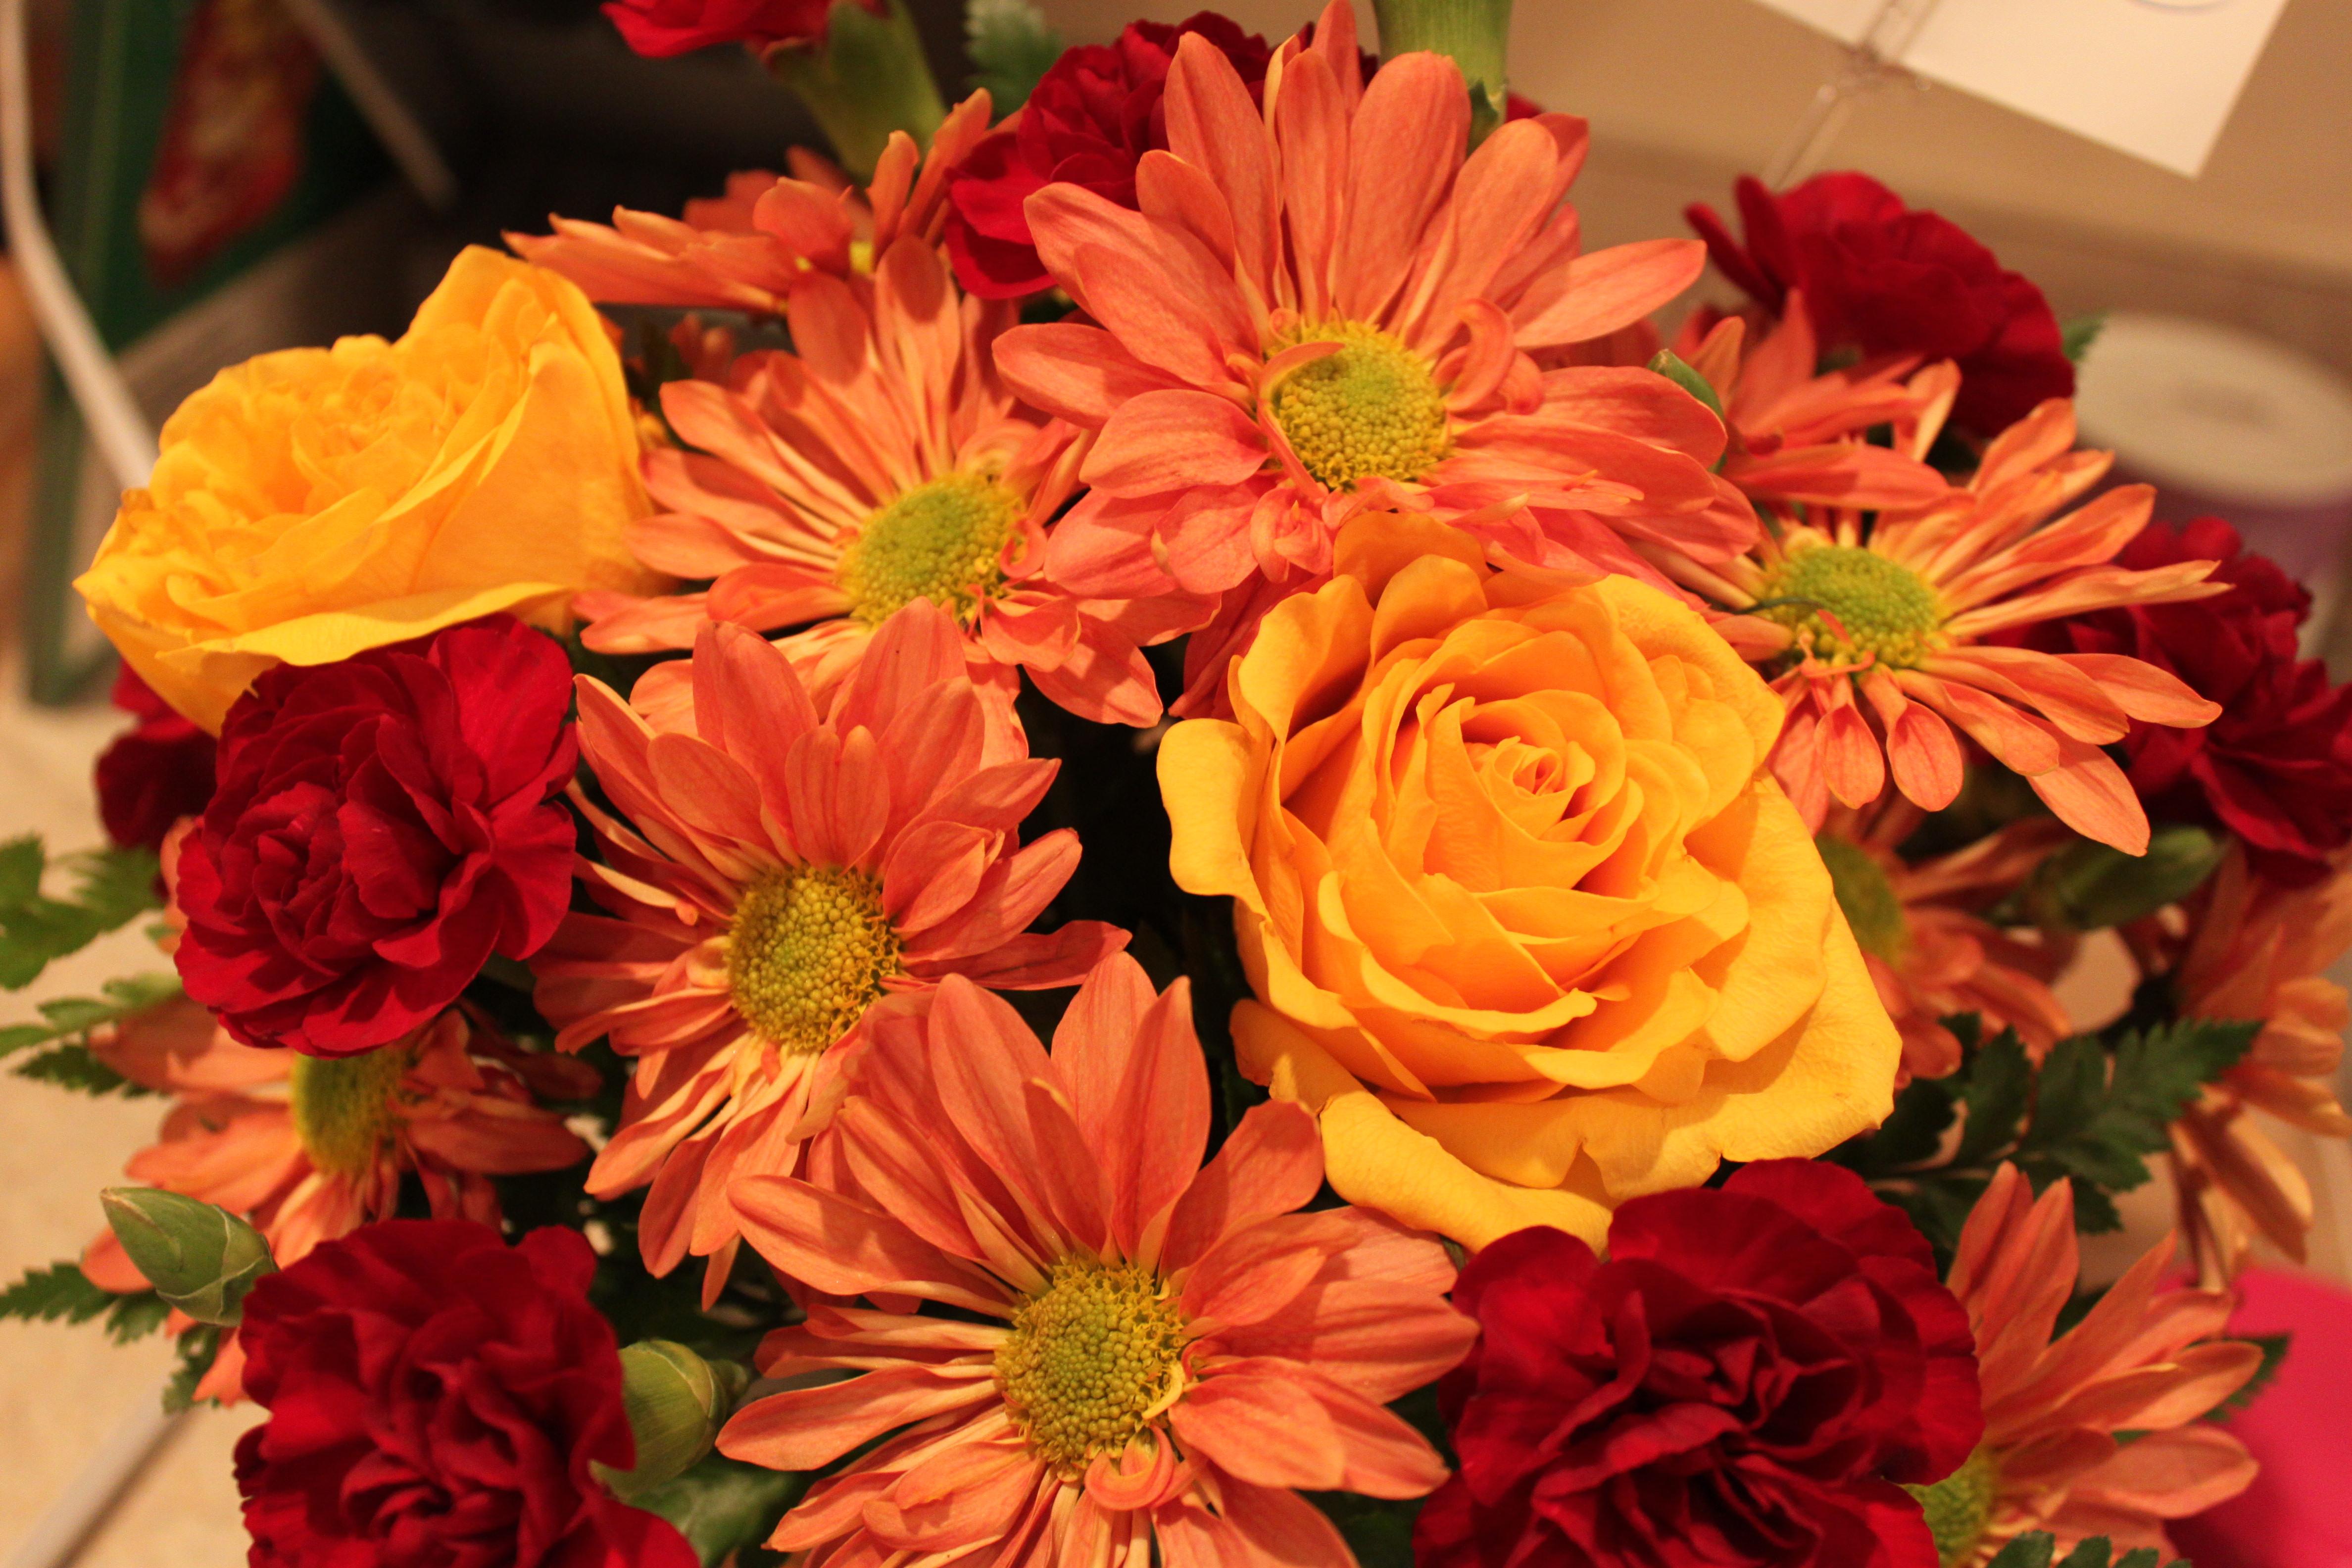 Beautiful Fall Flowers Wallpaper WallpaperSafari